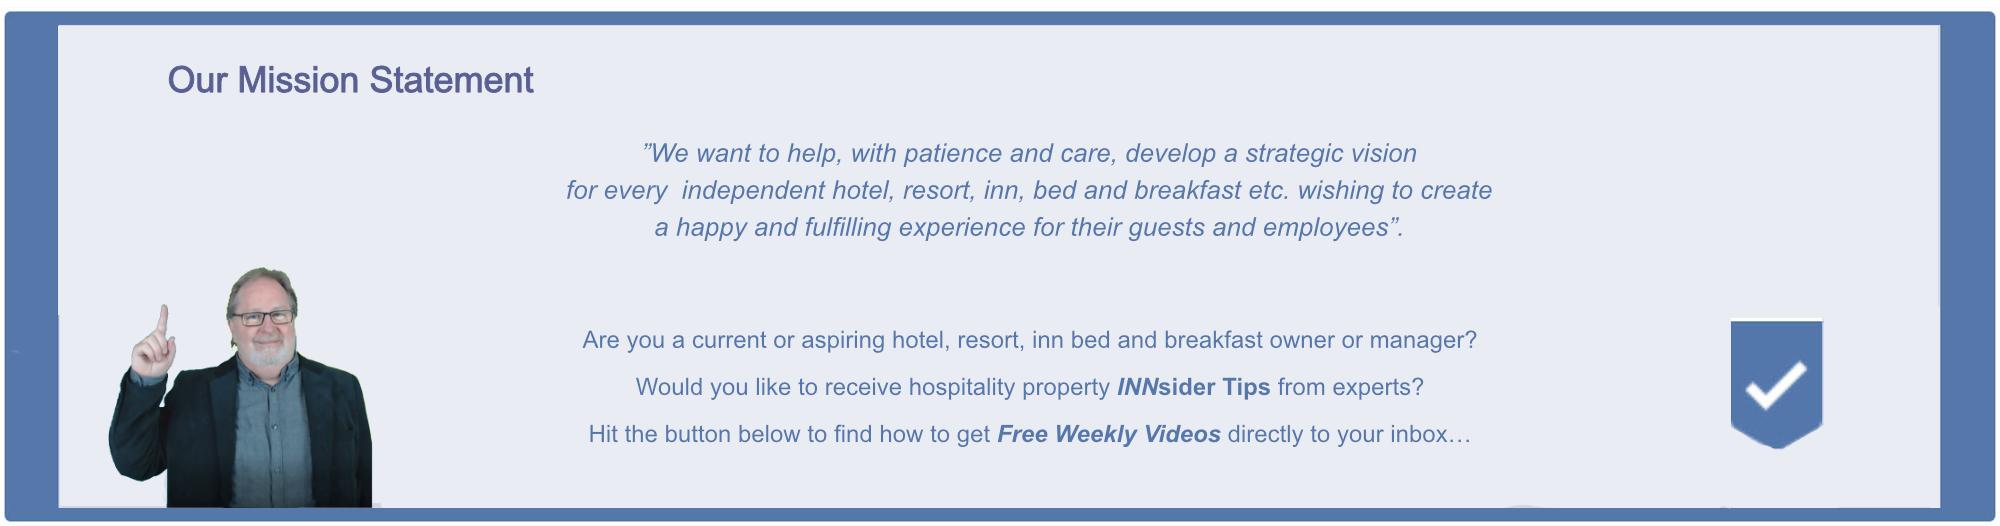 Making Your Hospitality Property Successful - Keystone HPD